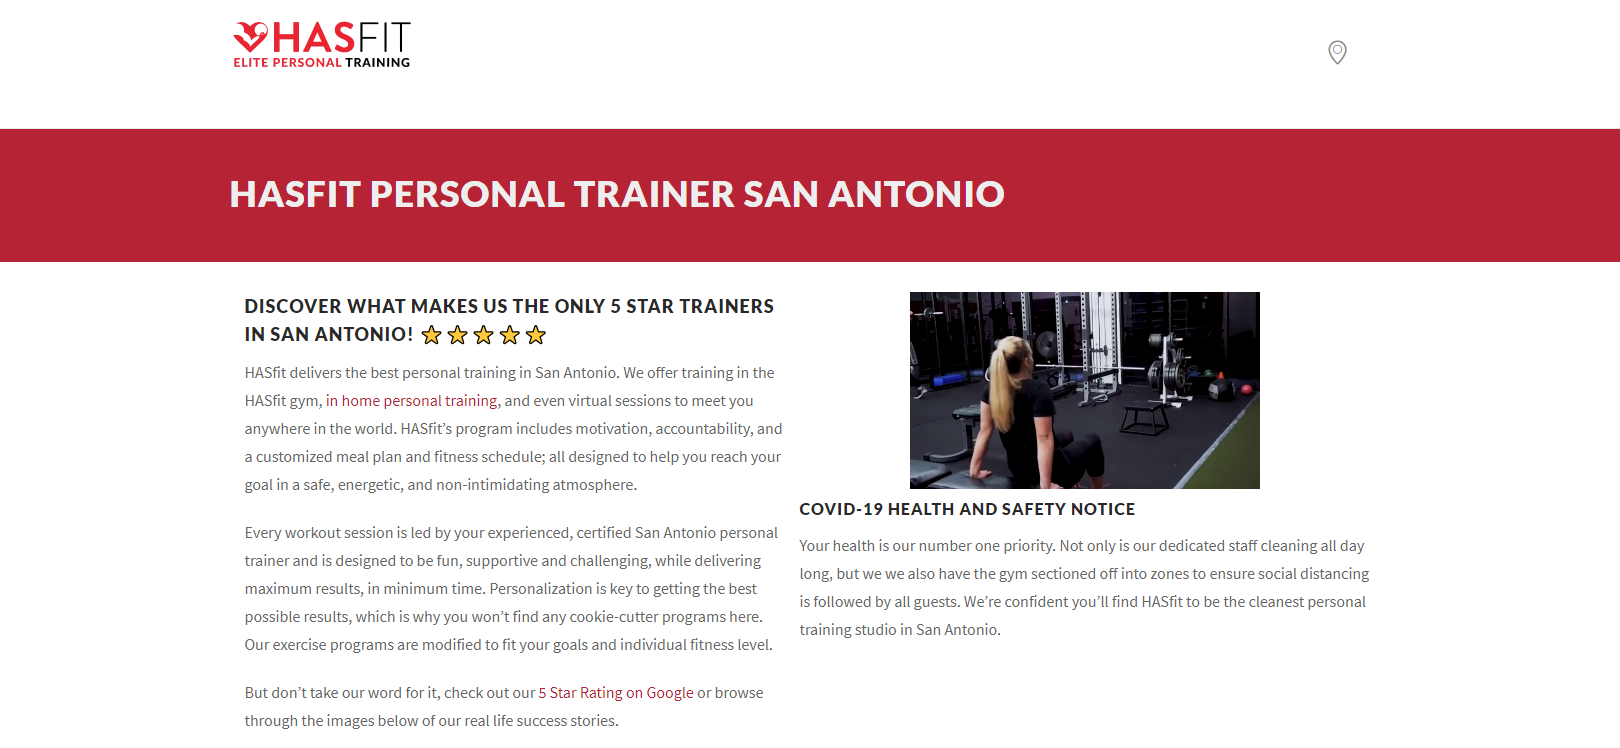 HasFit Elite Personal Trainer